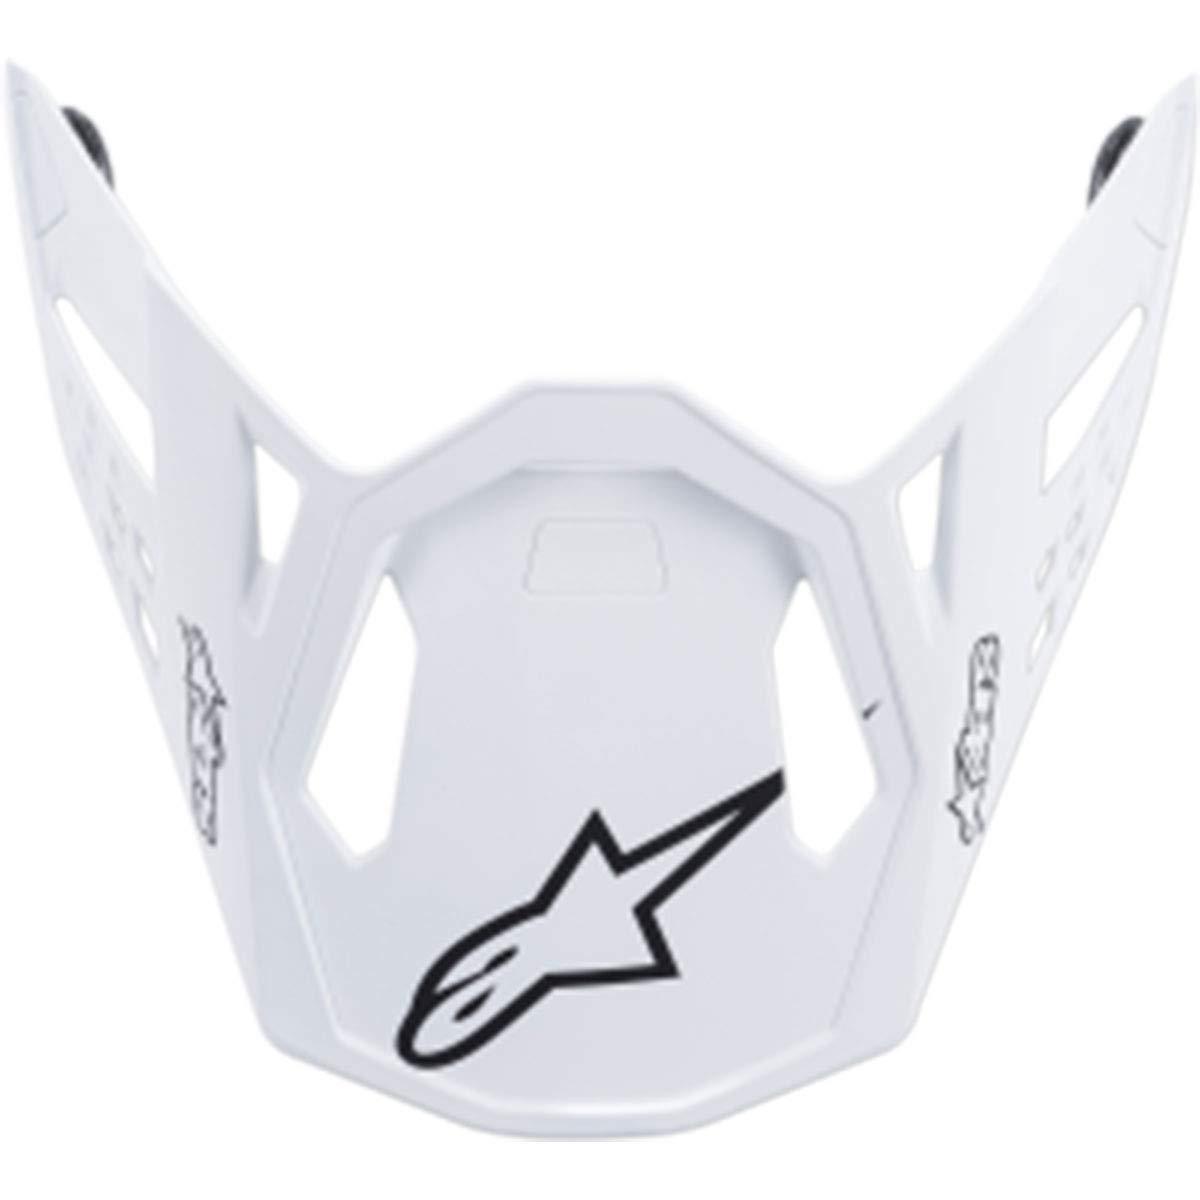 Alpinestars Supertech M10 Dyno Visor Off-Road Motorcycle Helmet Accessories - Matte White/One Size